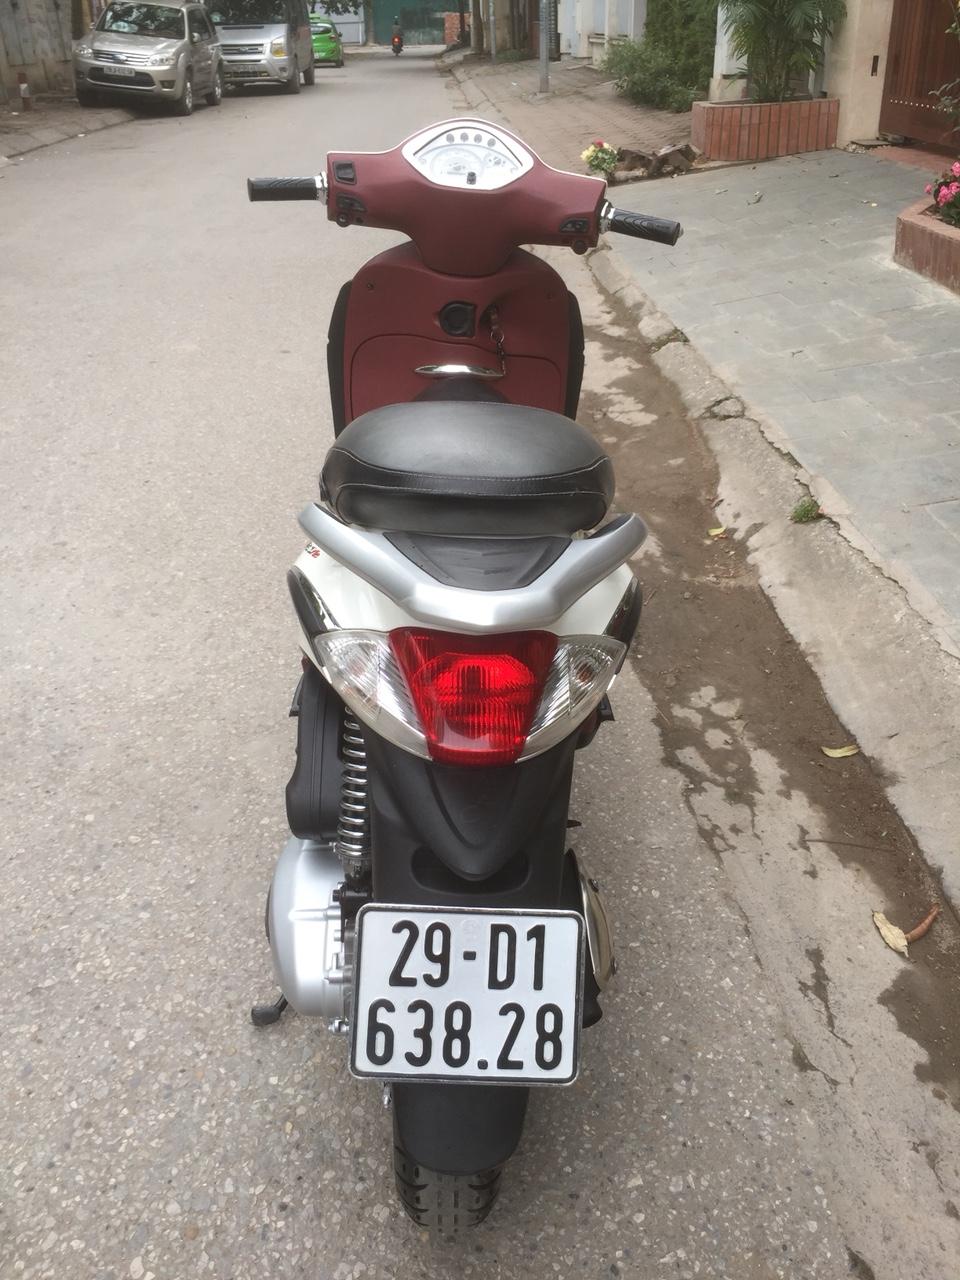 Can ban Liberty 125 3vie 2015 chinh chu con rat moi nguyen ban su dung - 3